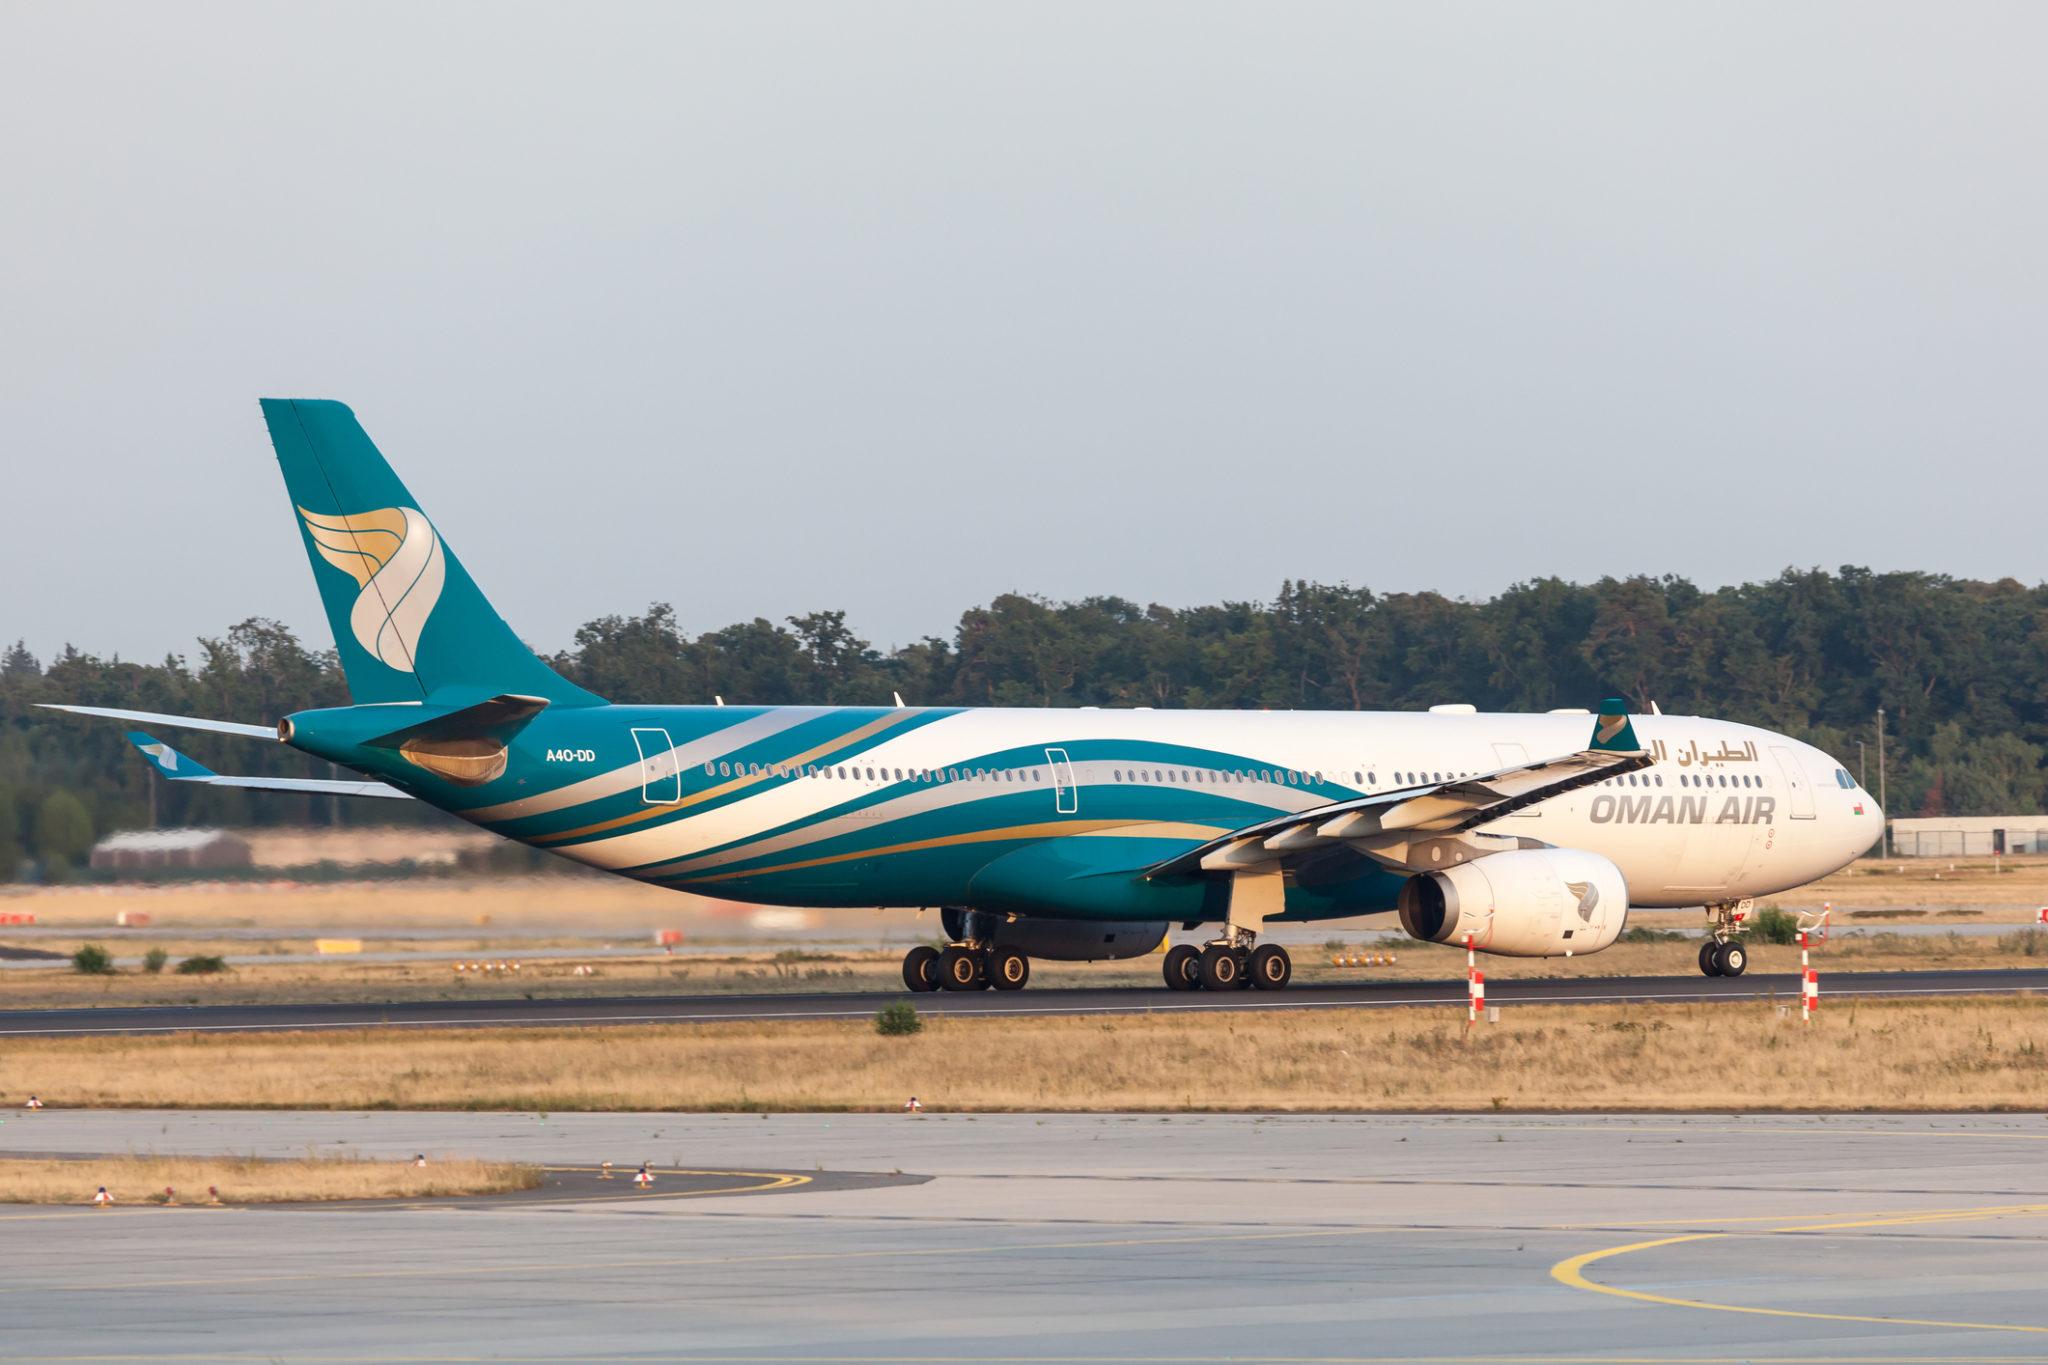 Letadlo Oman Air